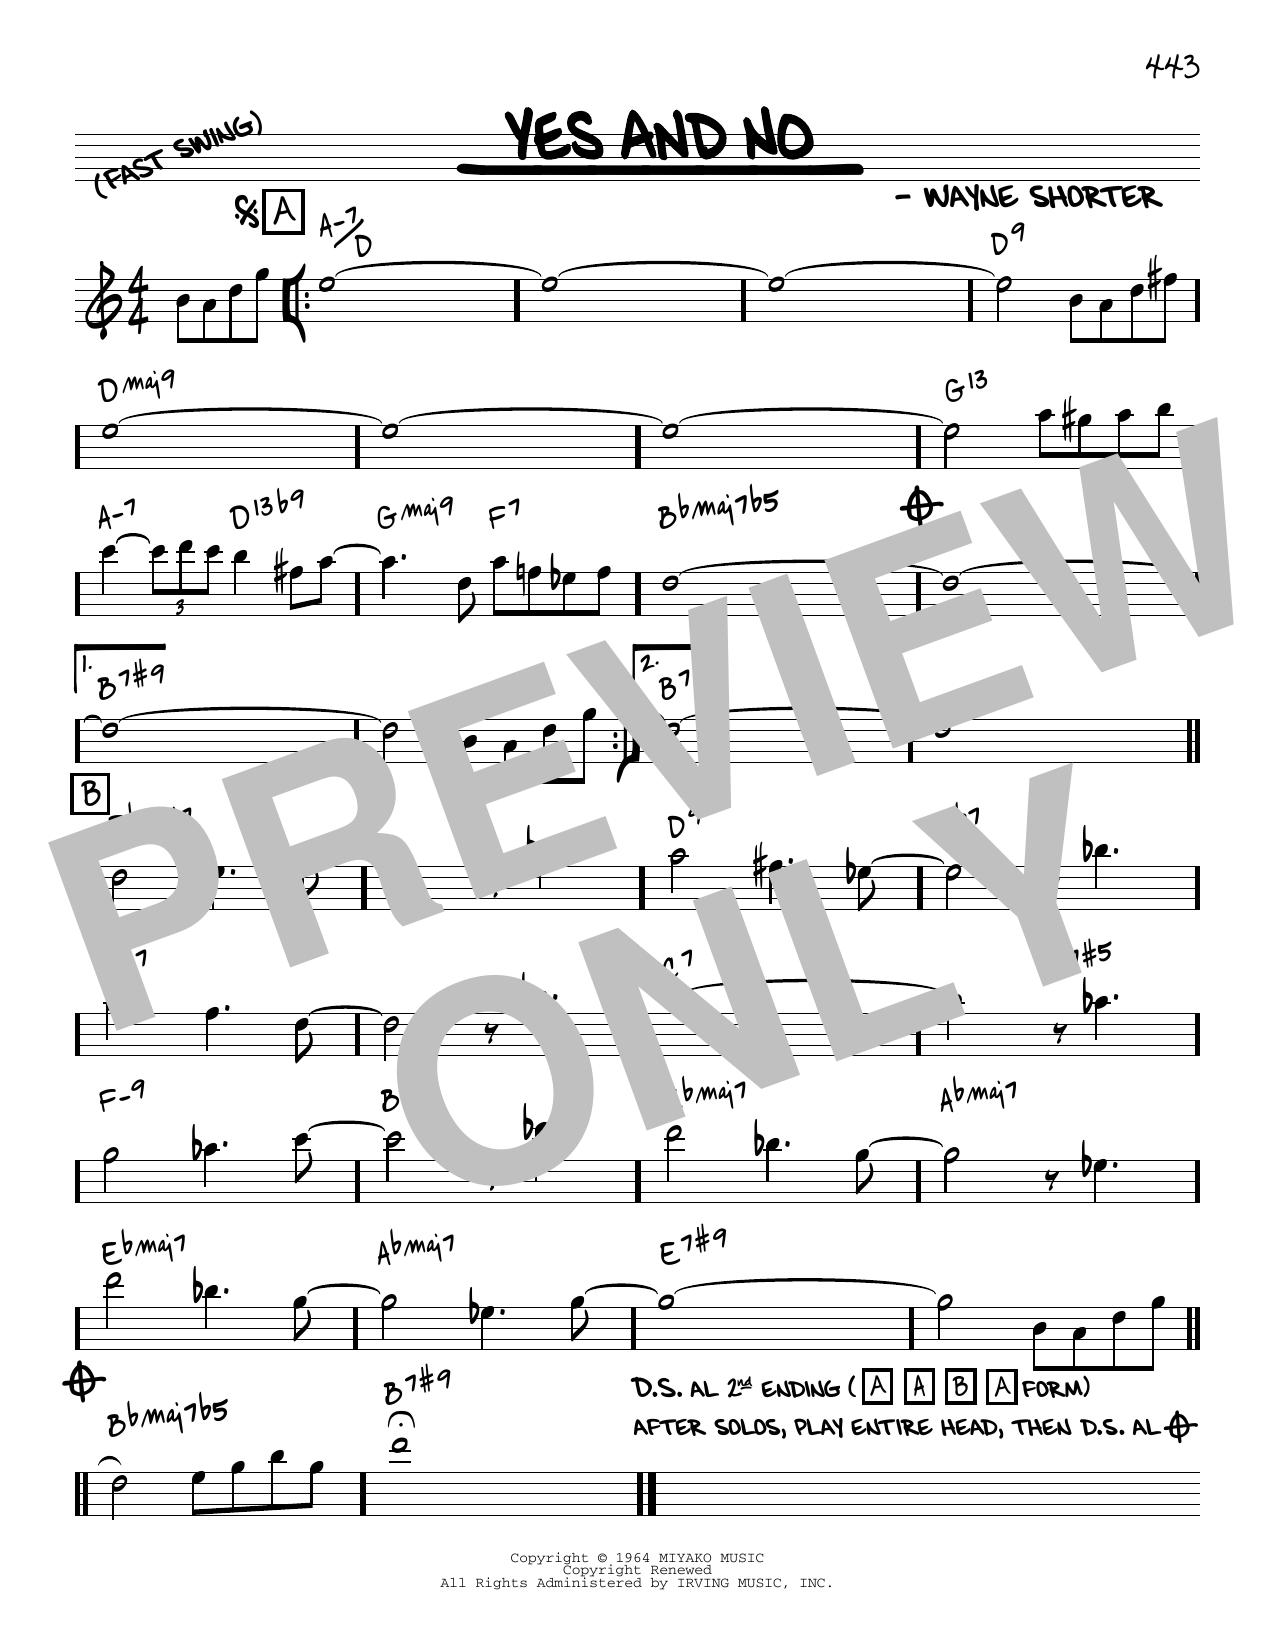 Wayne Shorter Yes And No [Reharmonized version] (arr. Jack Grassel) sheet music notes printable PDF score